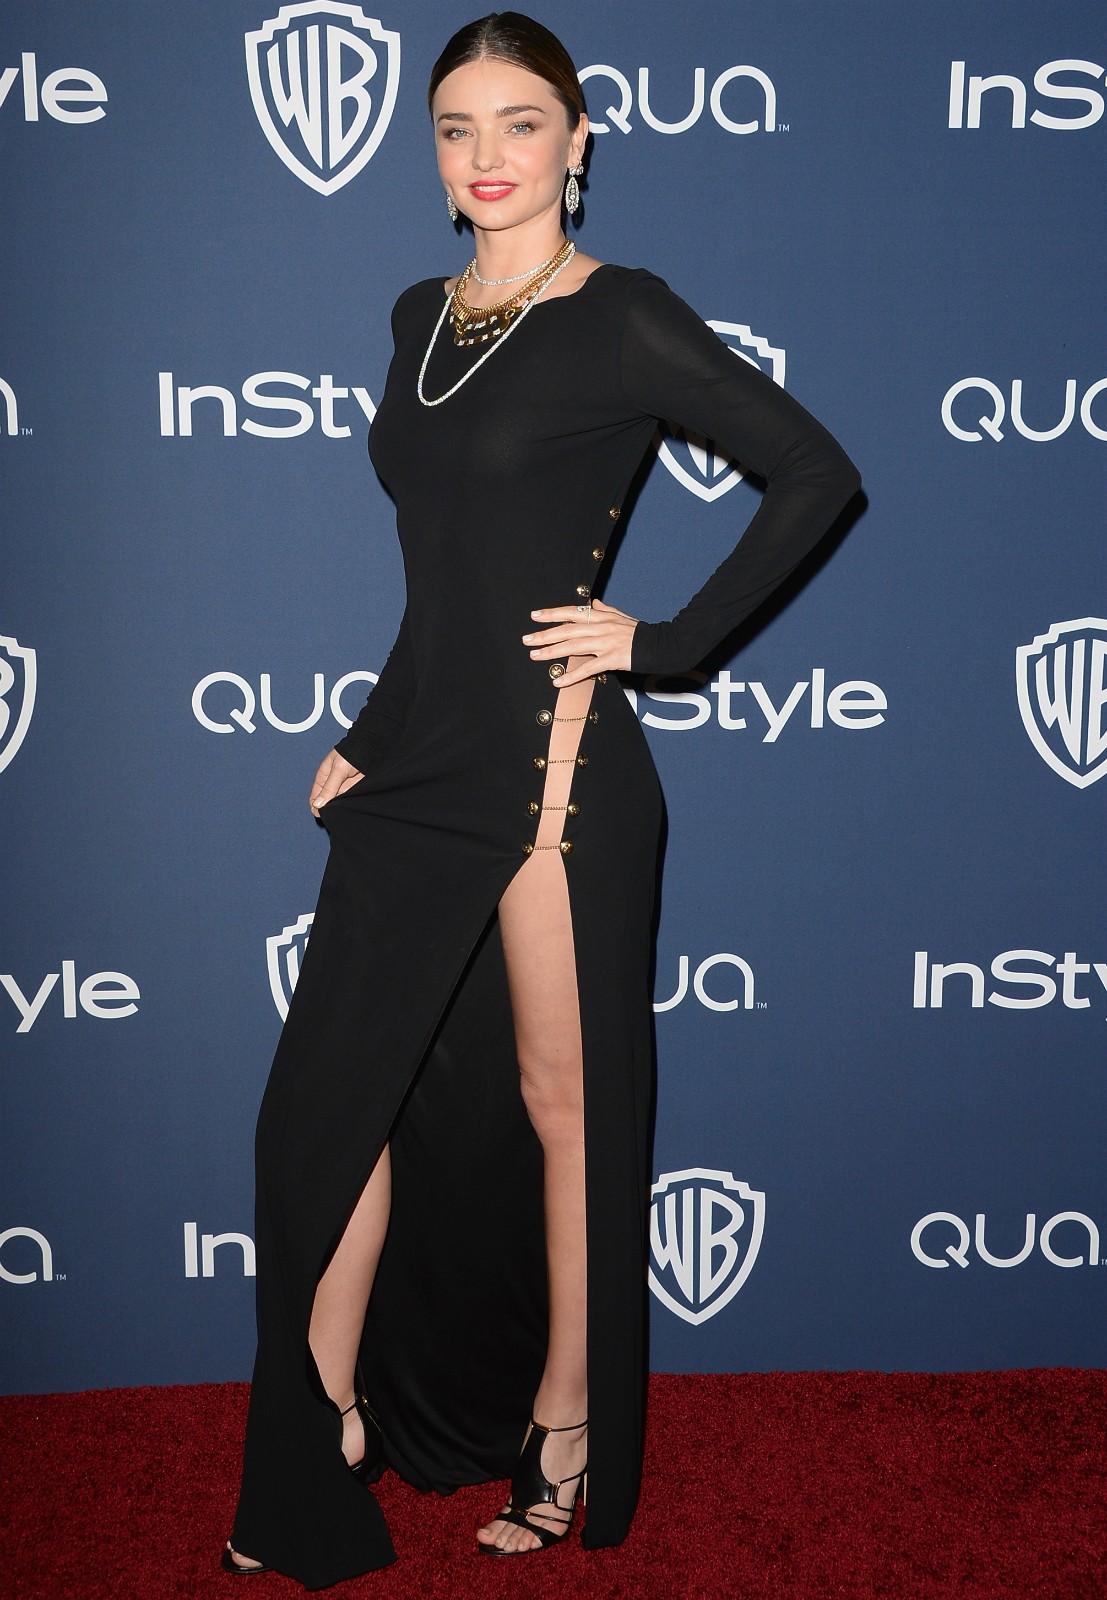 A supermodelo australiana Miranda Kerr numa festa pós-Globo de Ouro 2014. (Foto: Getty Images)